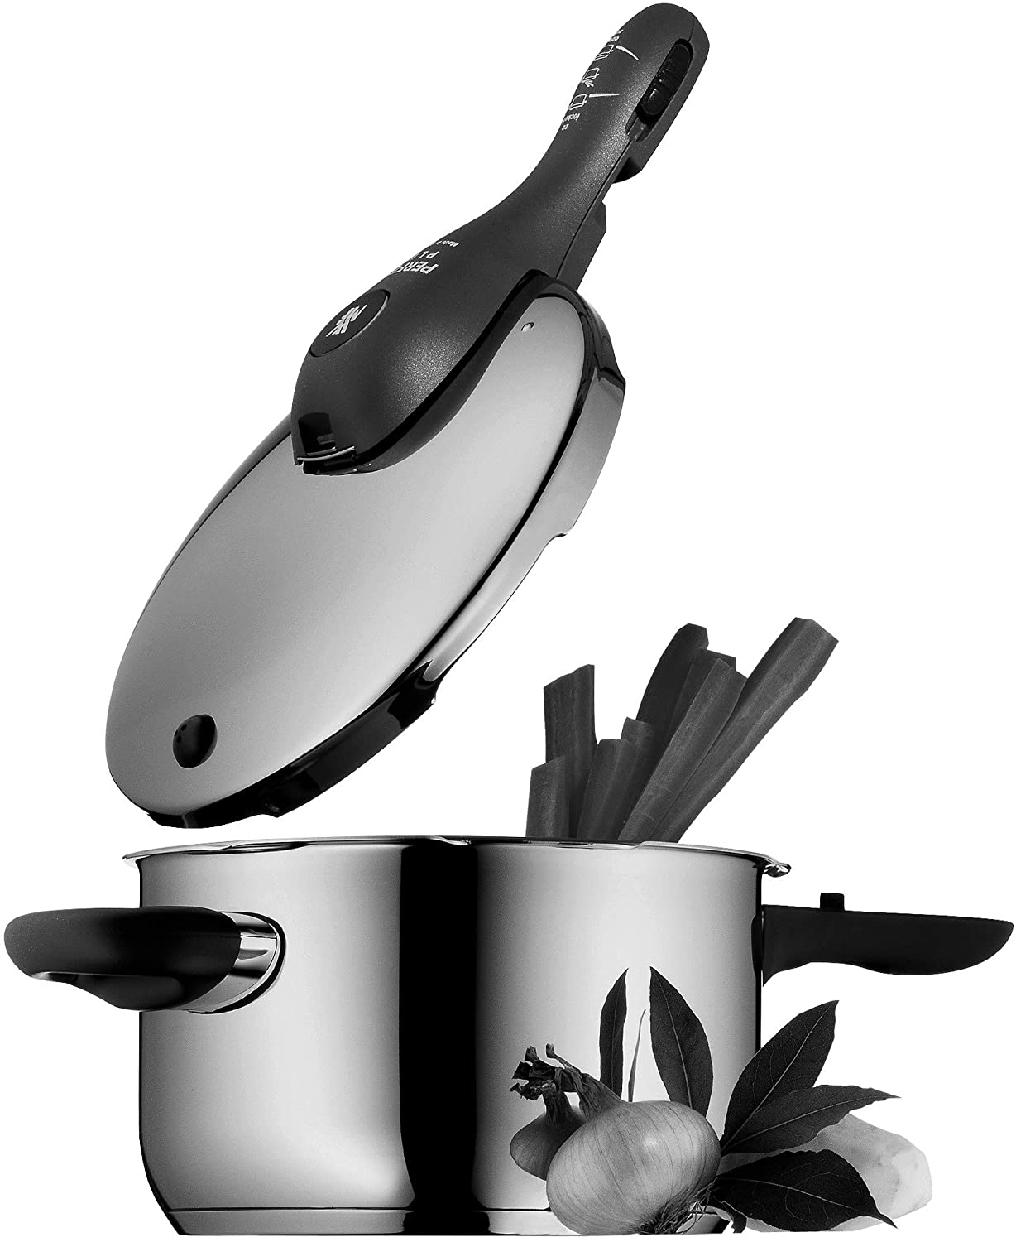 WMF(ヴェーエムエフ) パーフェクト プラス 圧力鍋の商品画像16